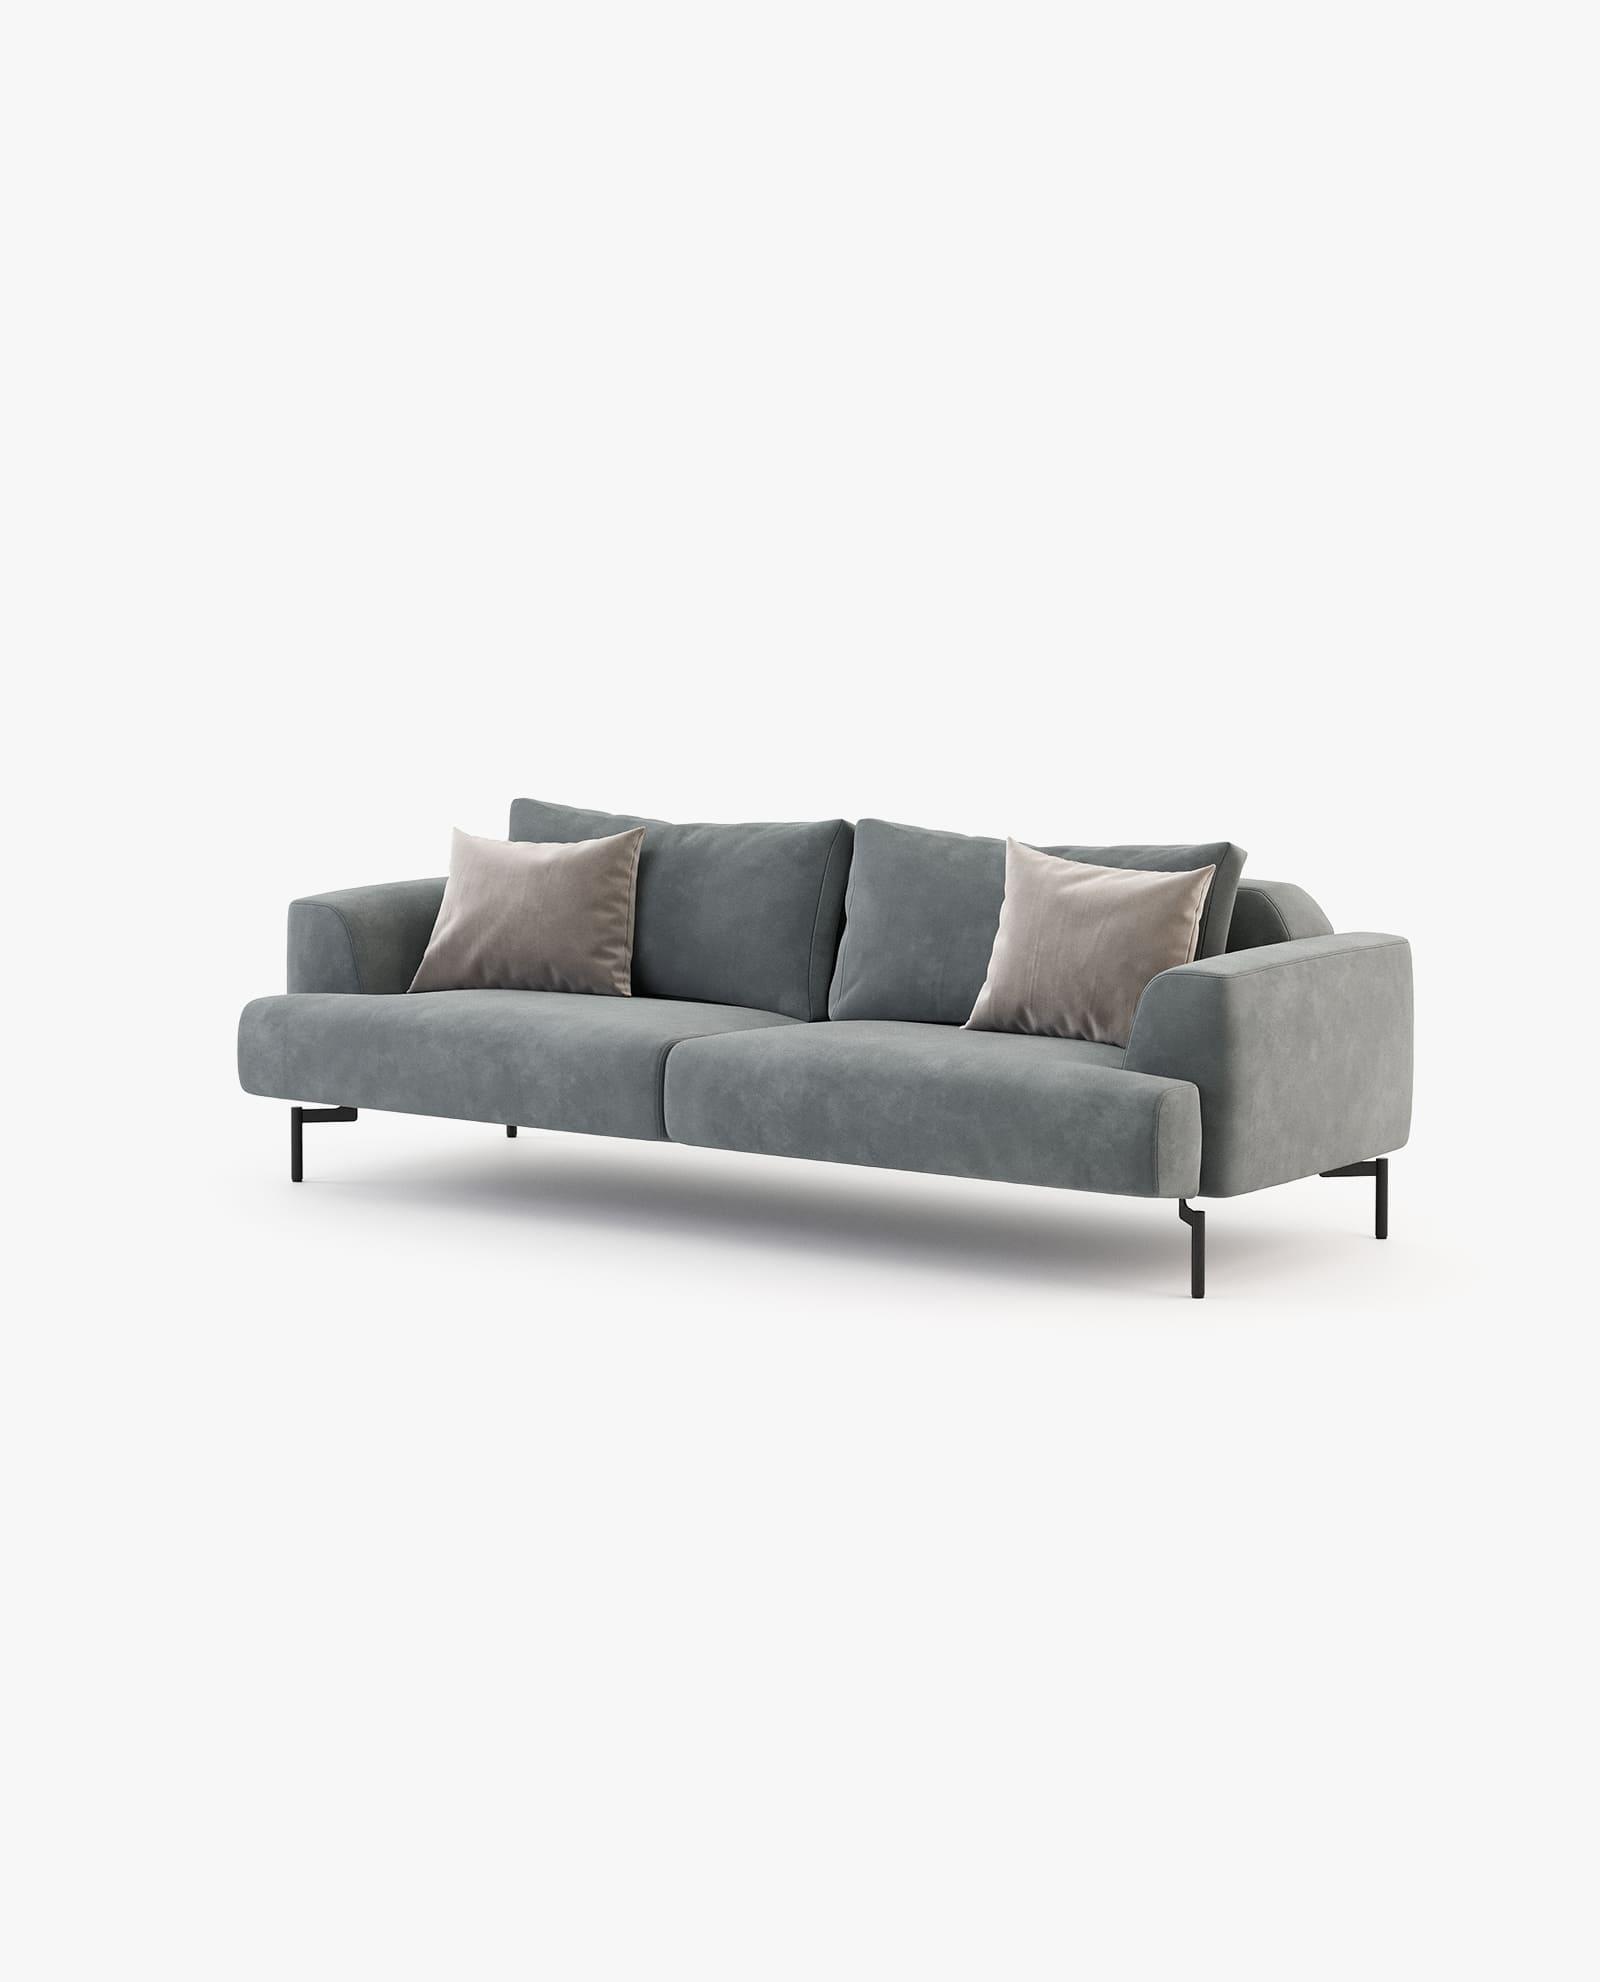 sofá moderno em veludo cinza